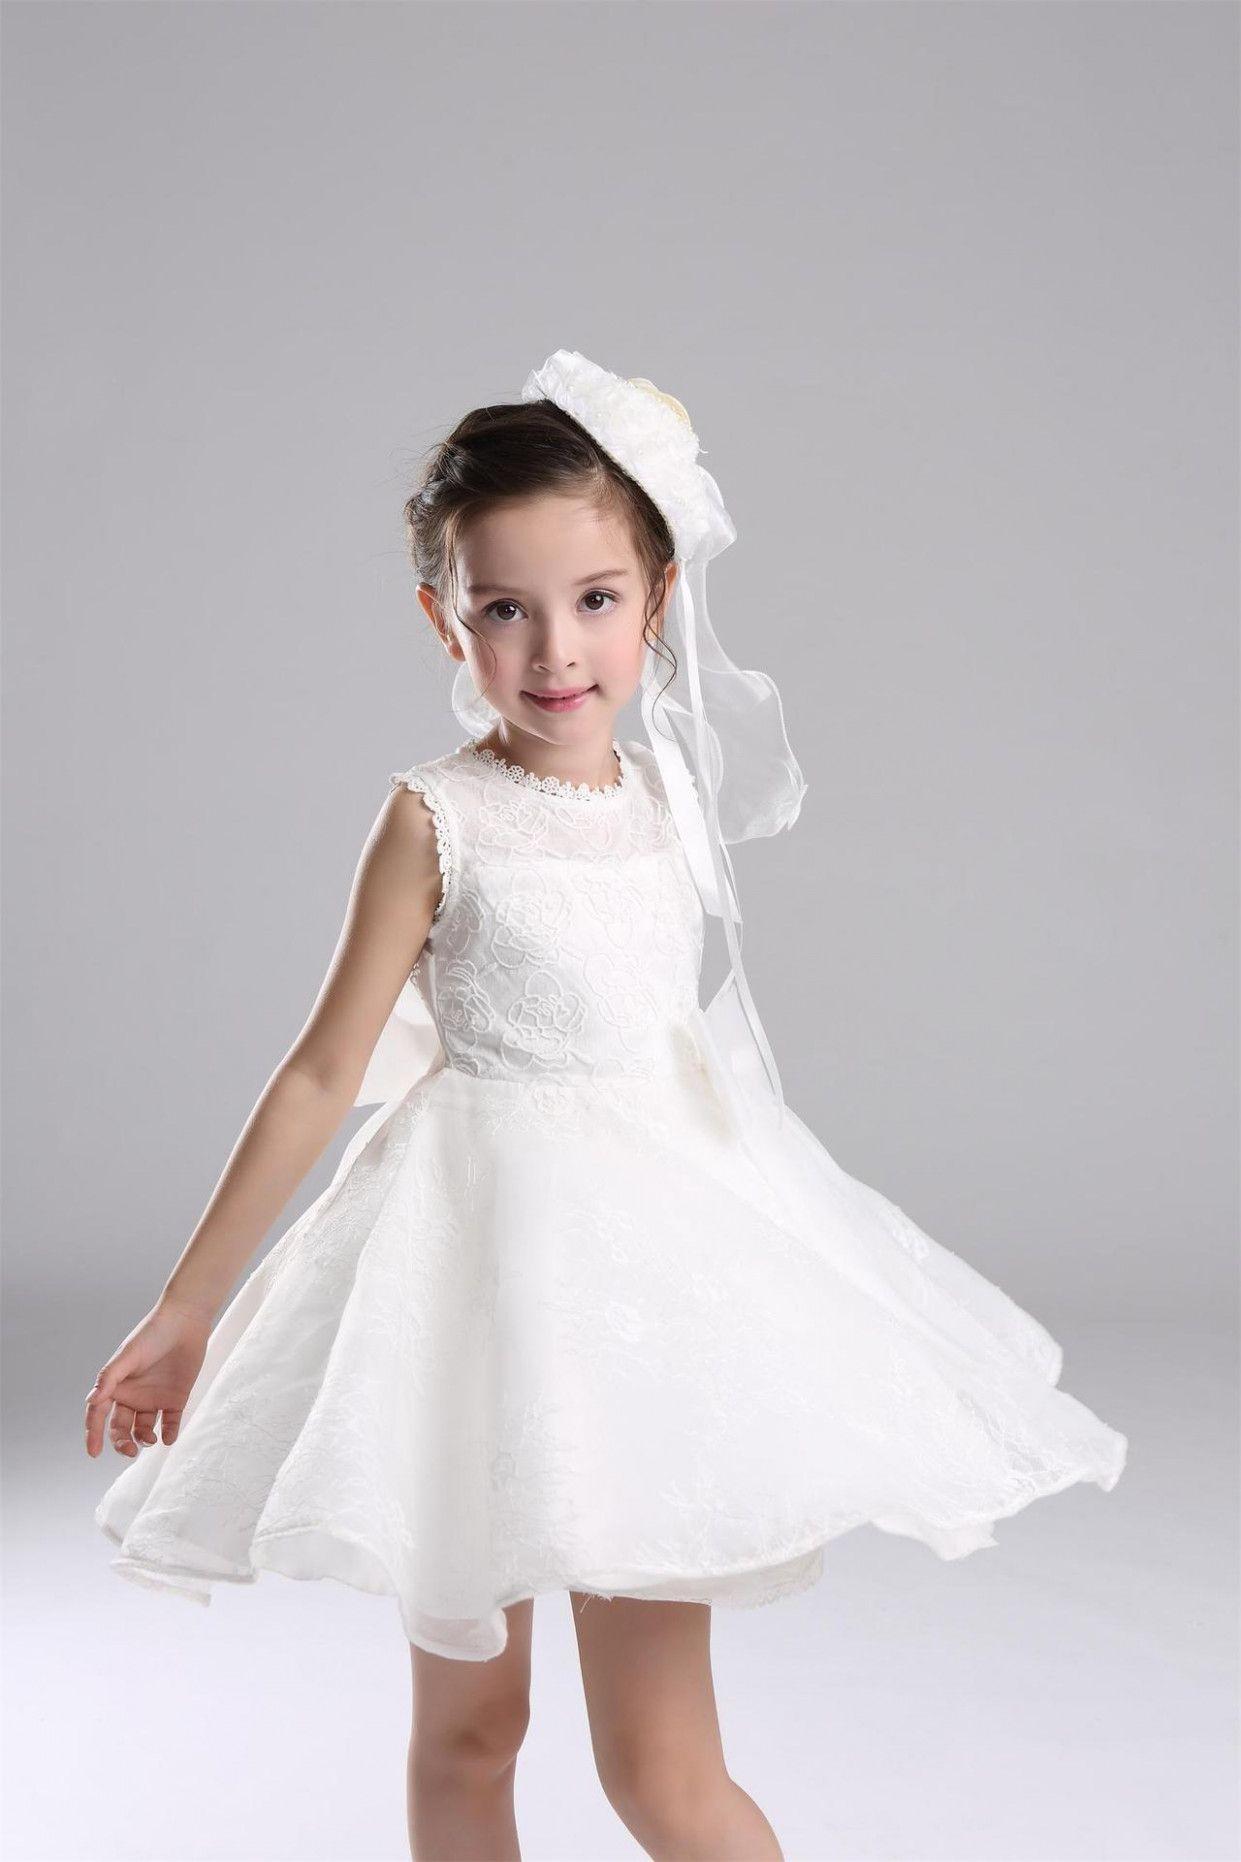 6379386f4 Baby Girl Dress Children Wedding Dress Princess Bridesmaid Flower ...